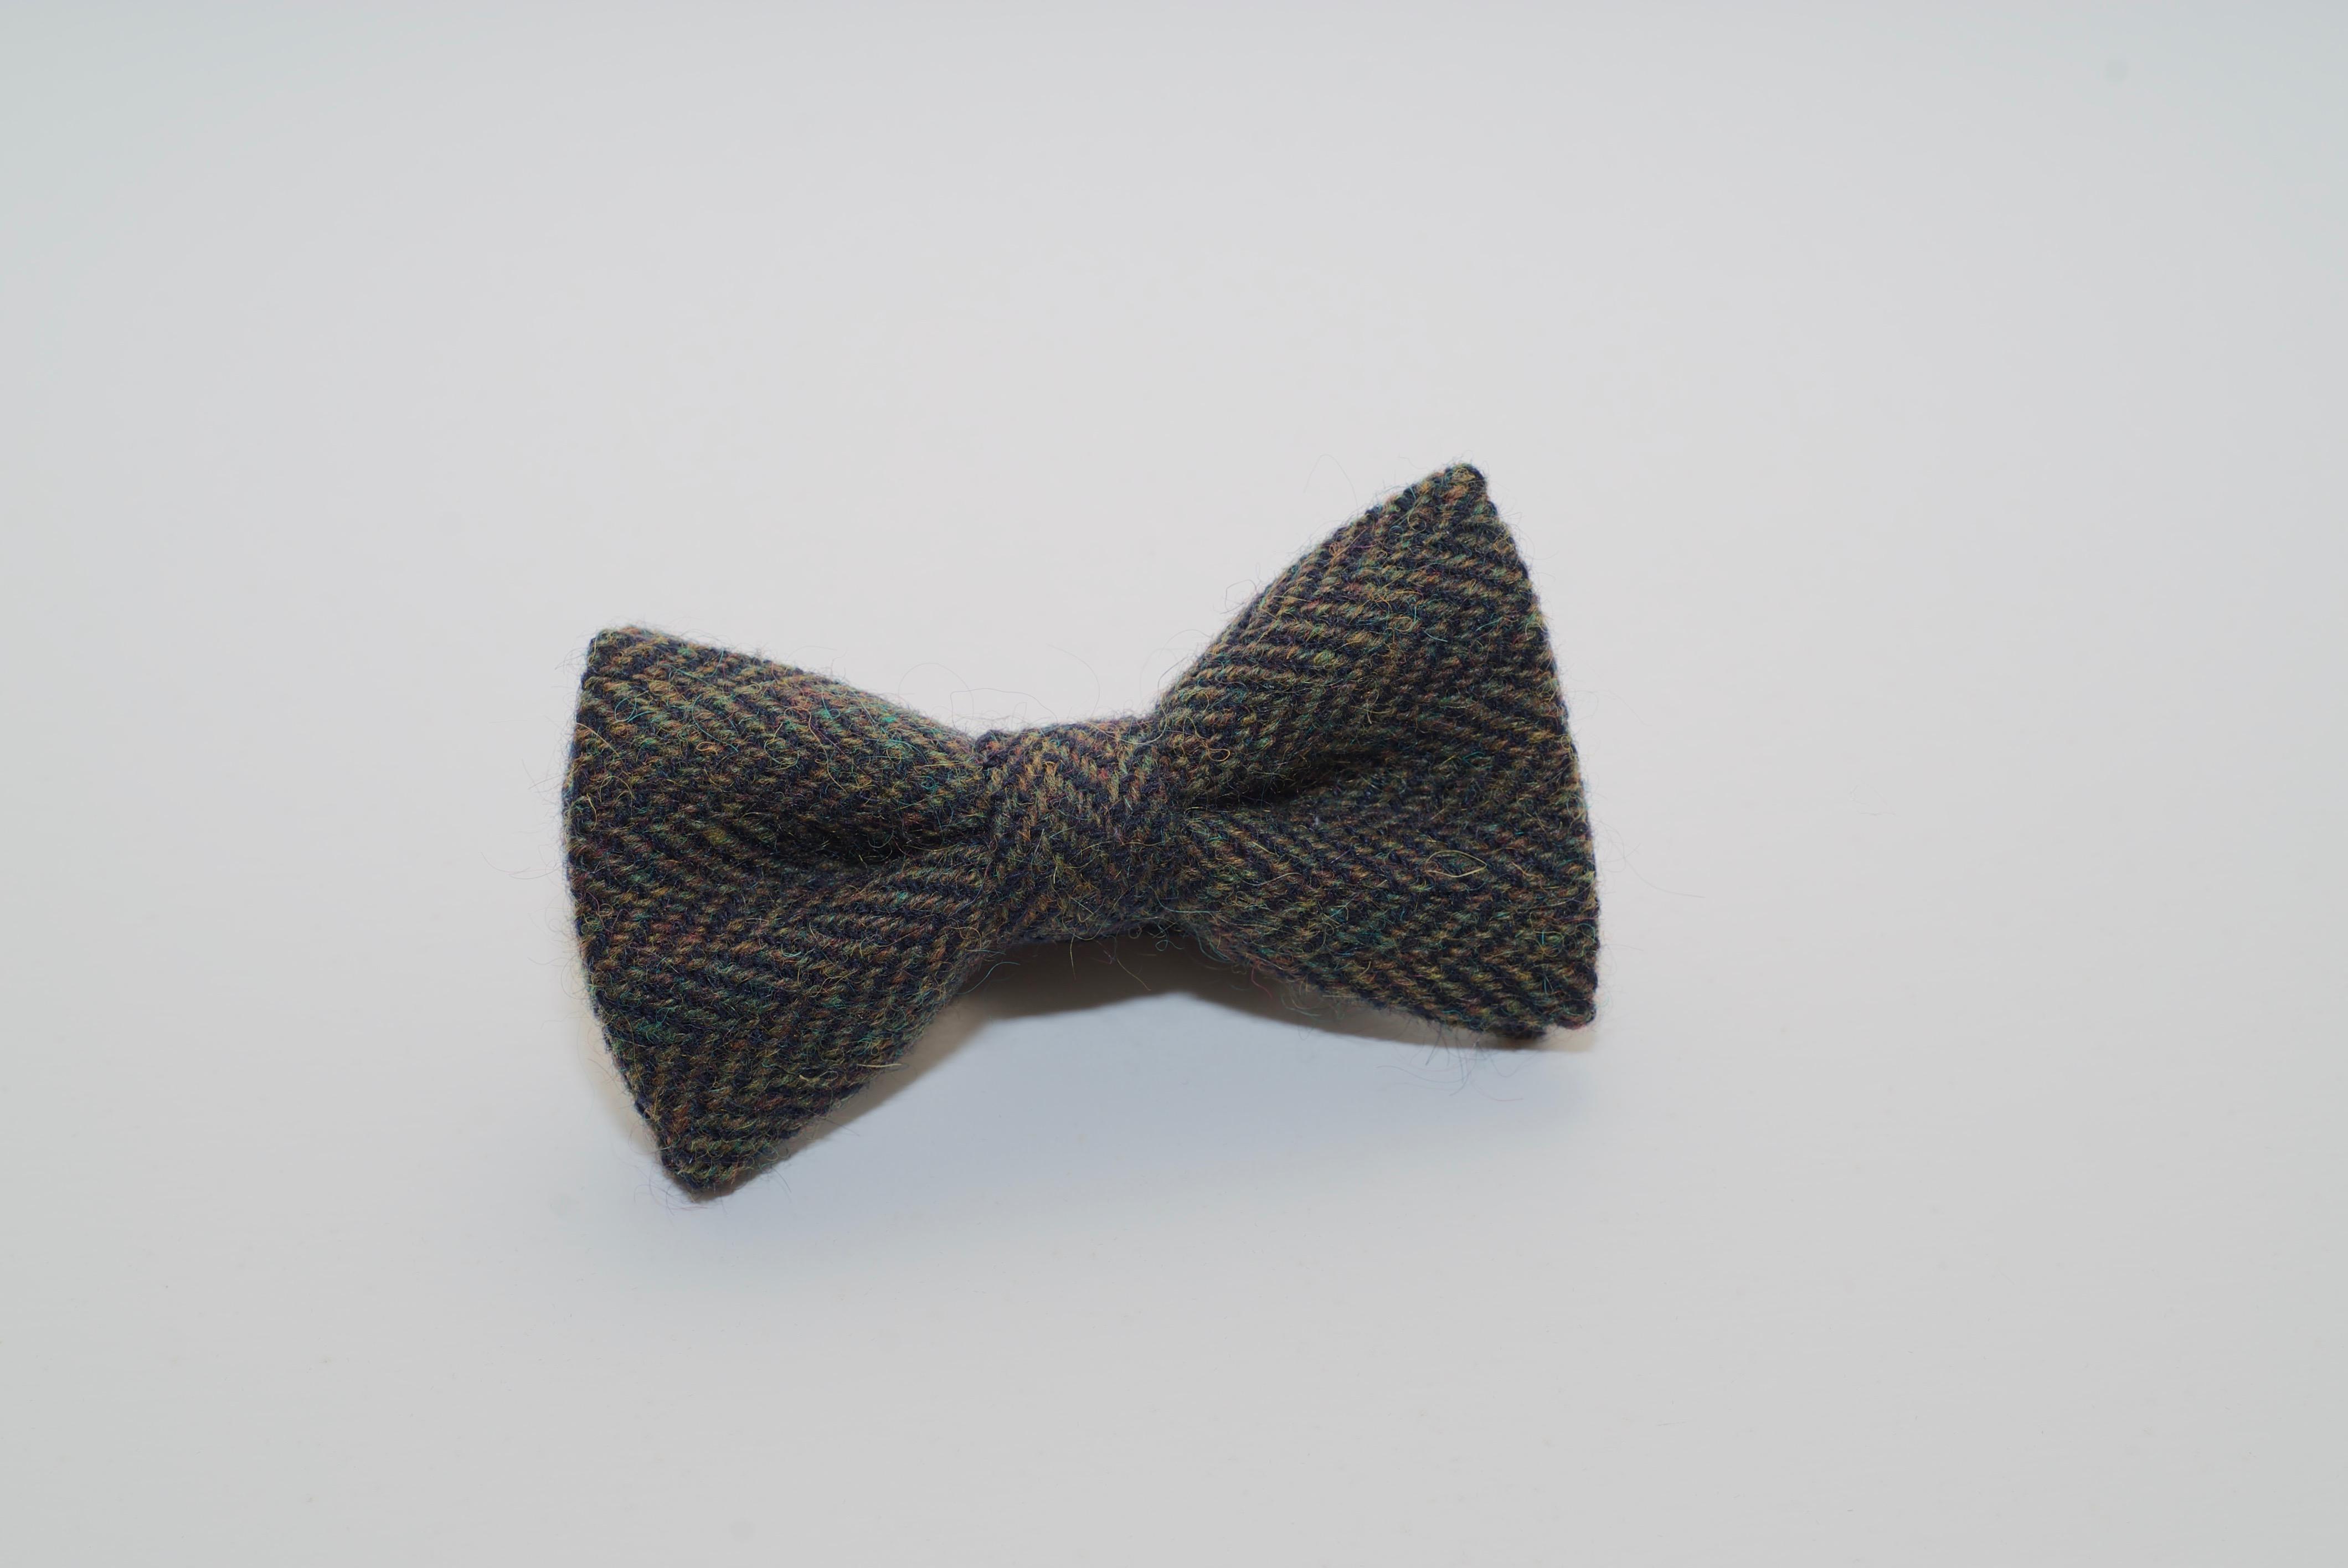 Donegal Tweed Bow Green Black Herringbone